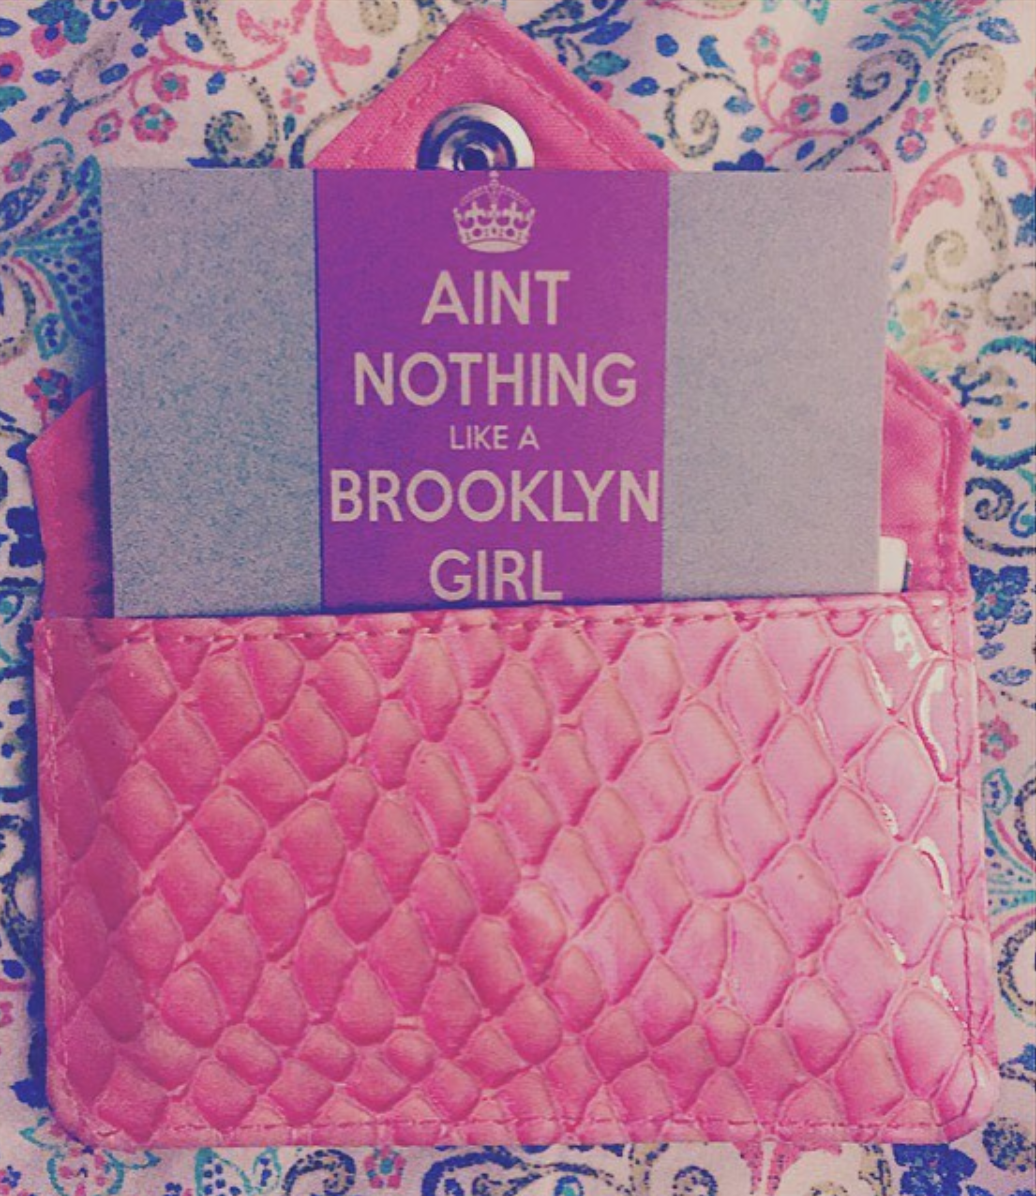 #BrooklynGirlCode